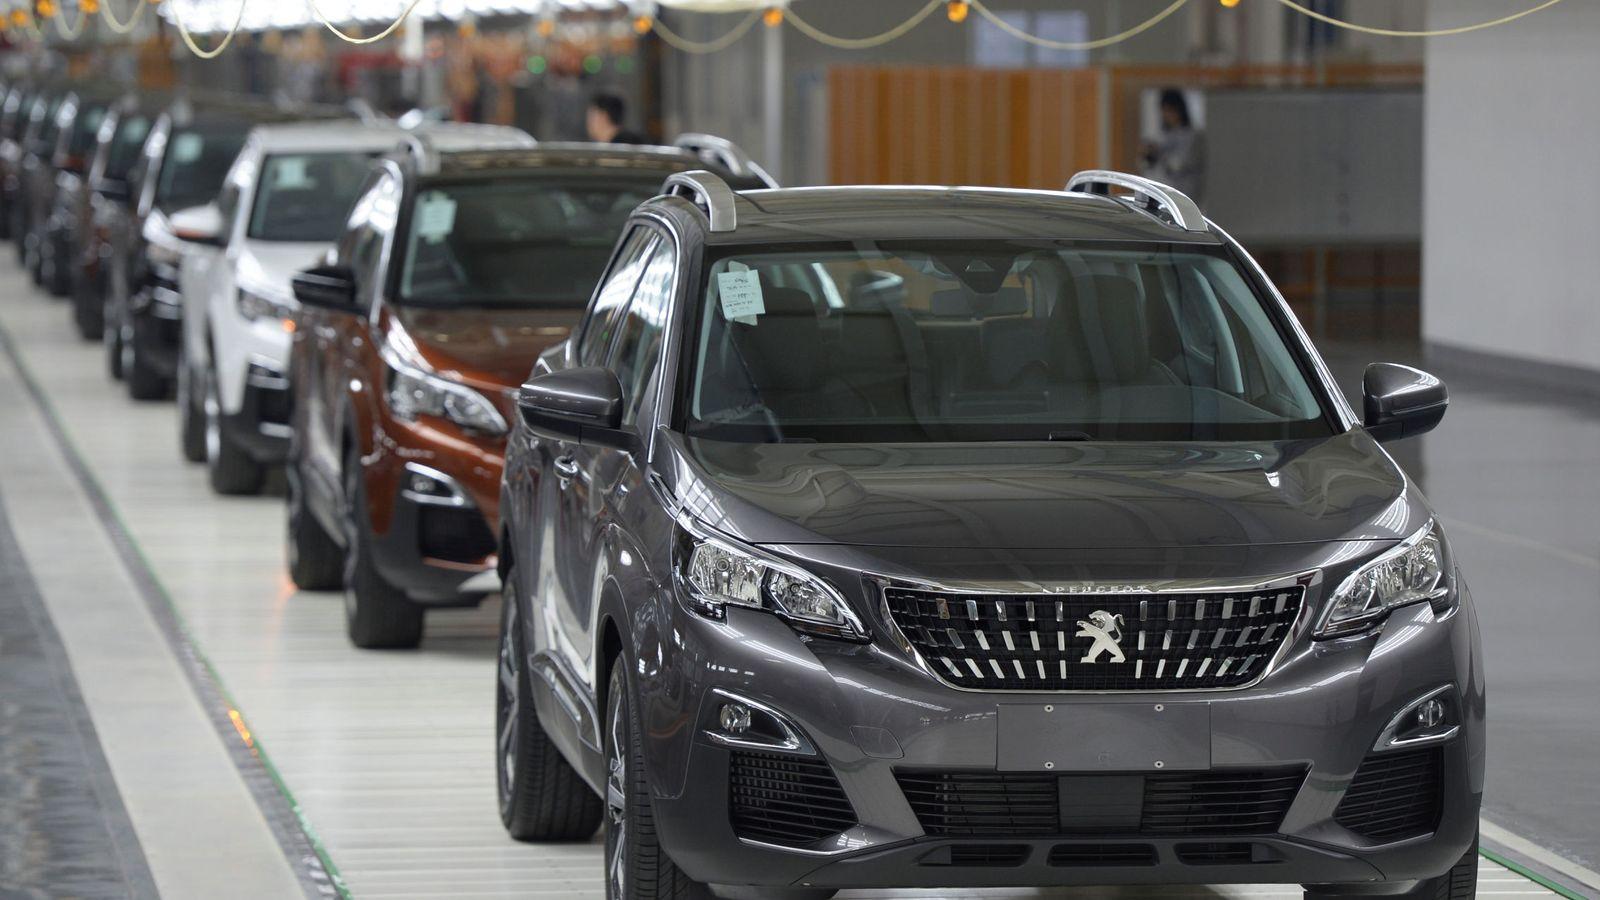 Foto: Fábrica de Peugeot Citroen. (Reuters)